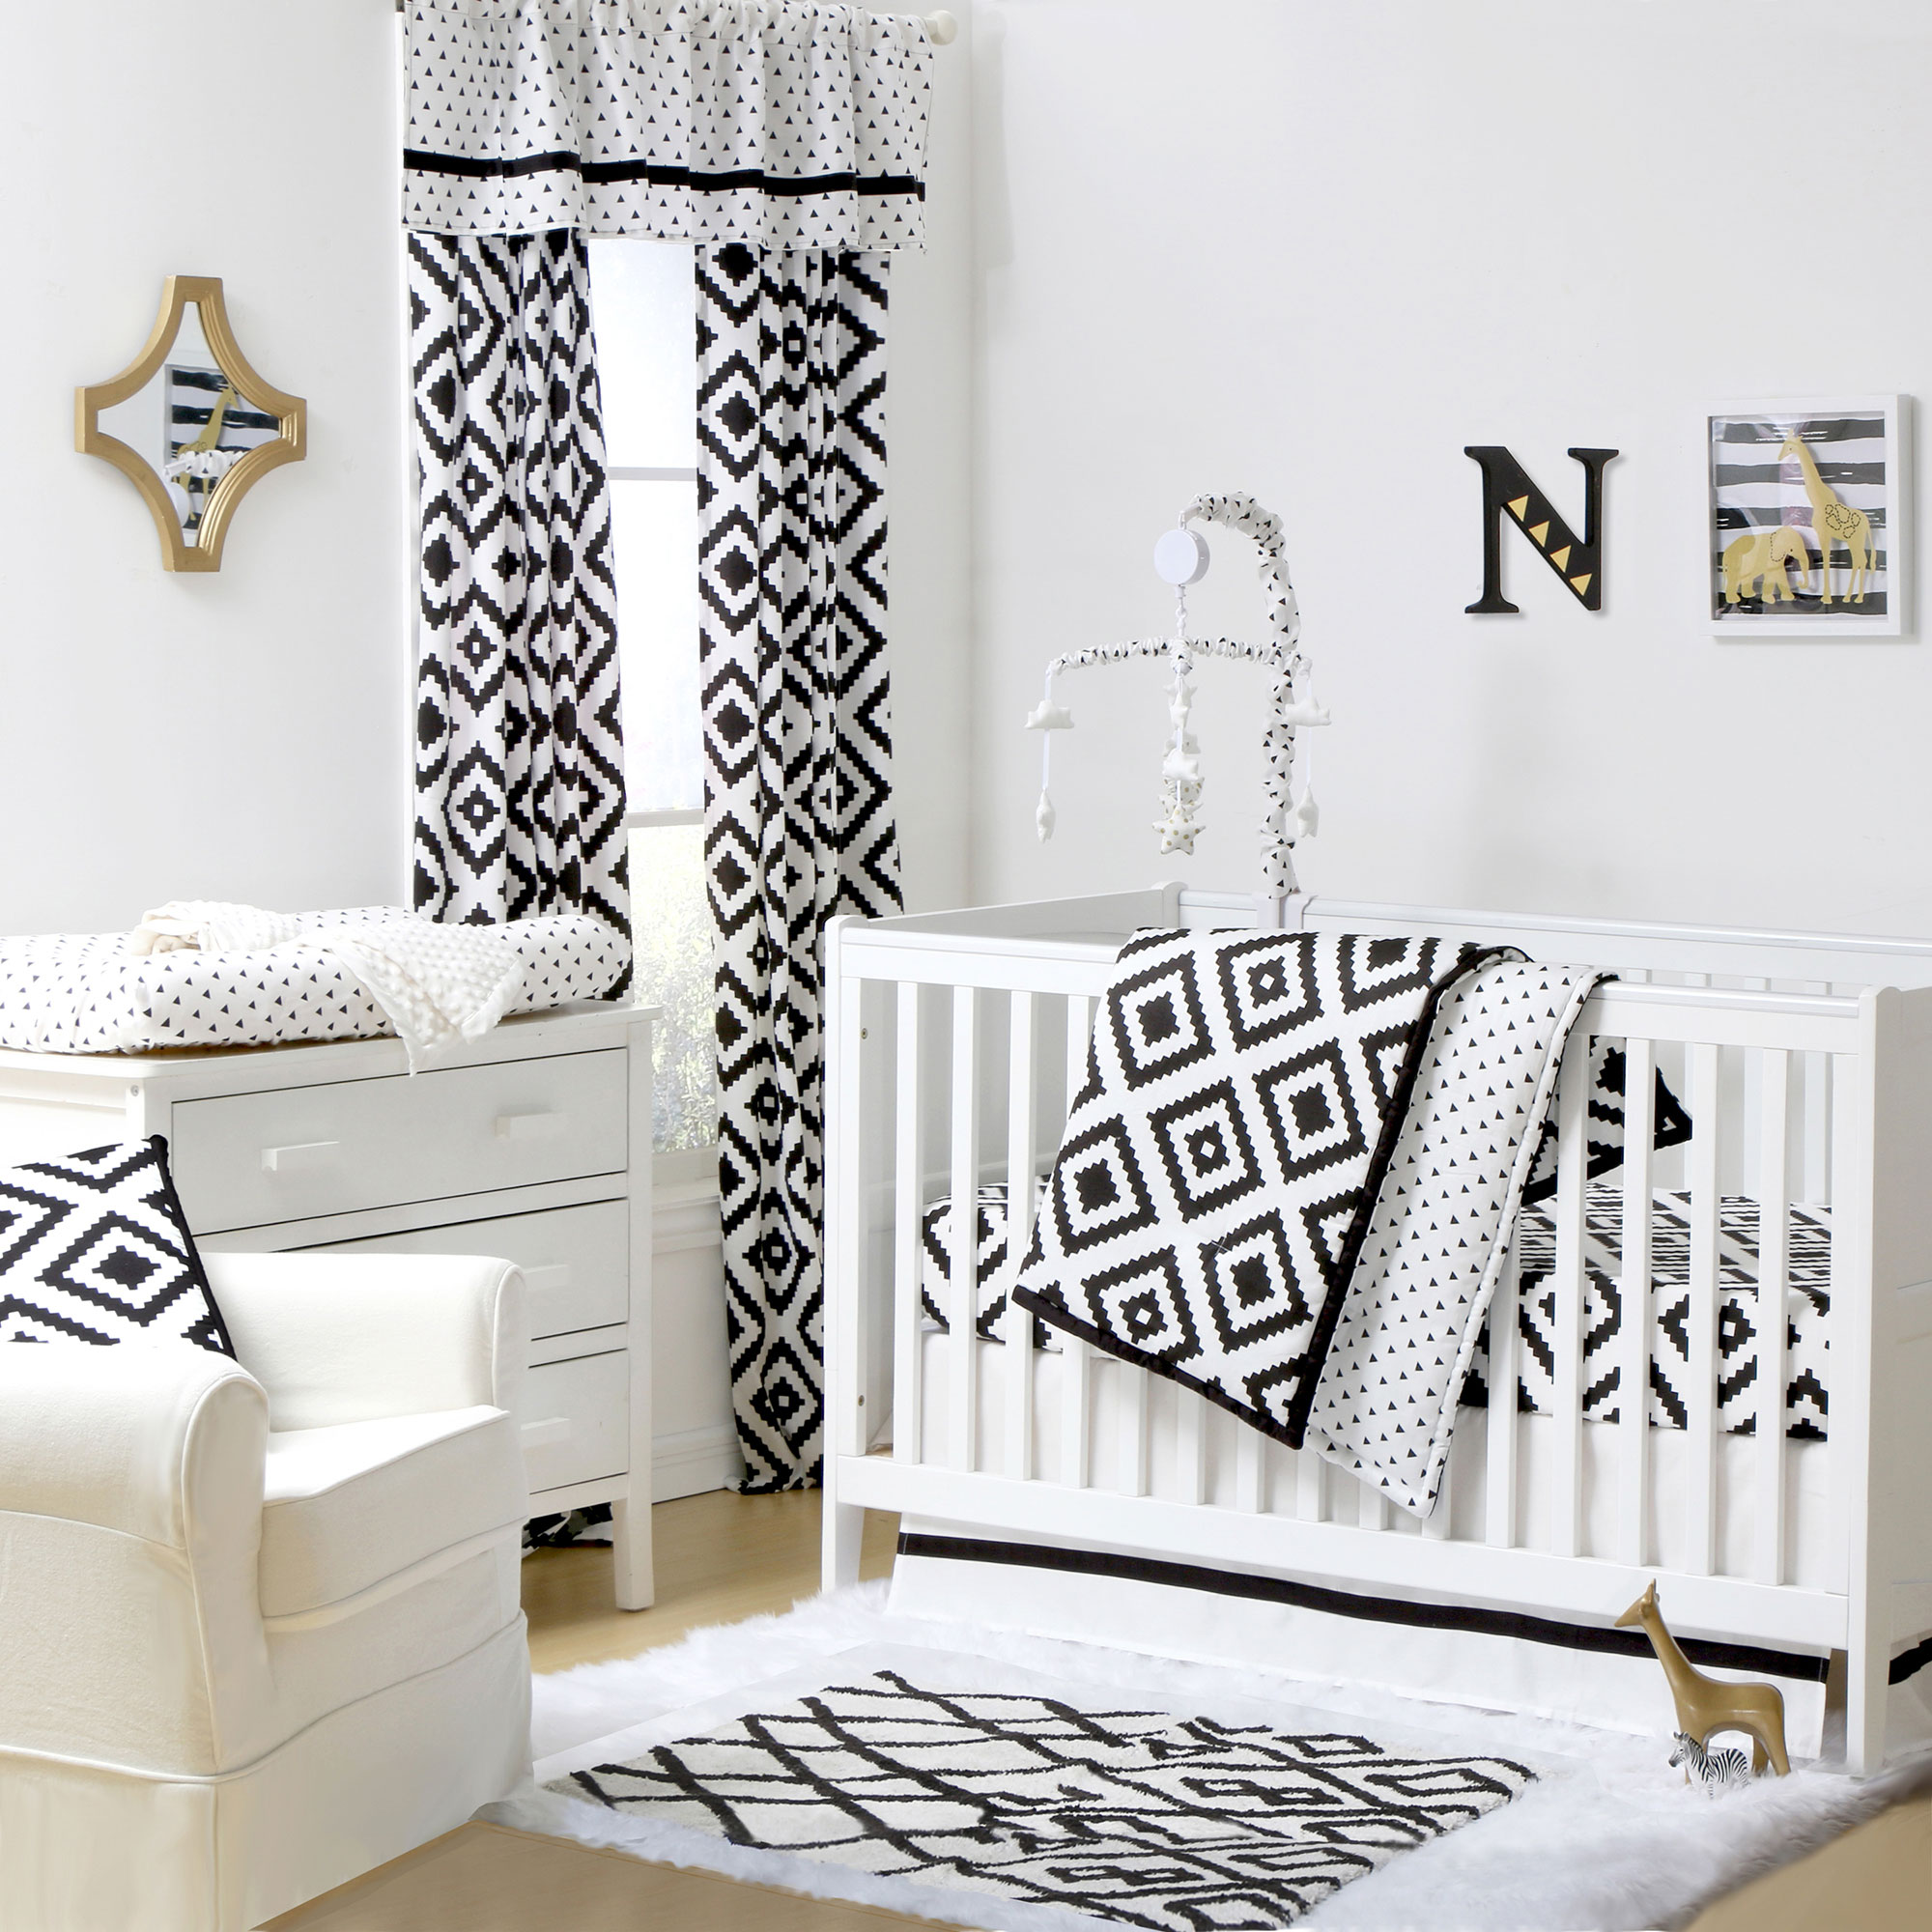 Peanut Shell 4 Piece Baby Crib Bedding Set - Black Diamon...